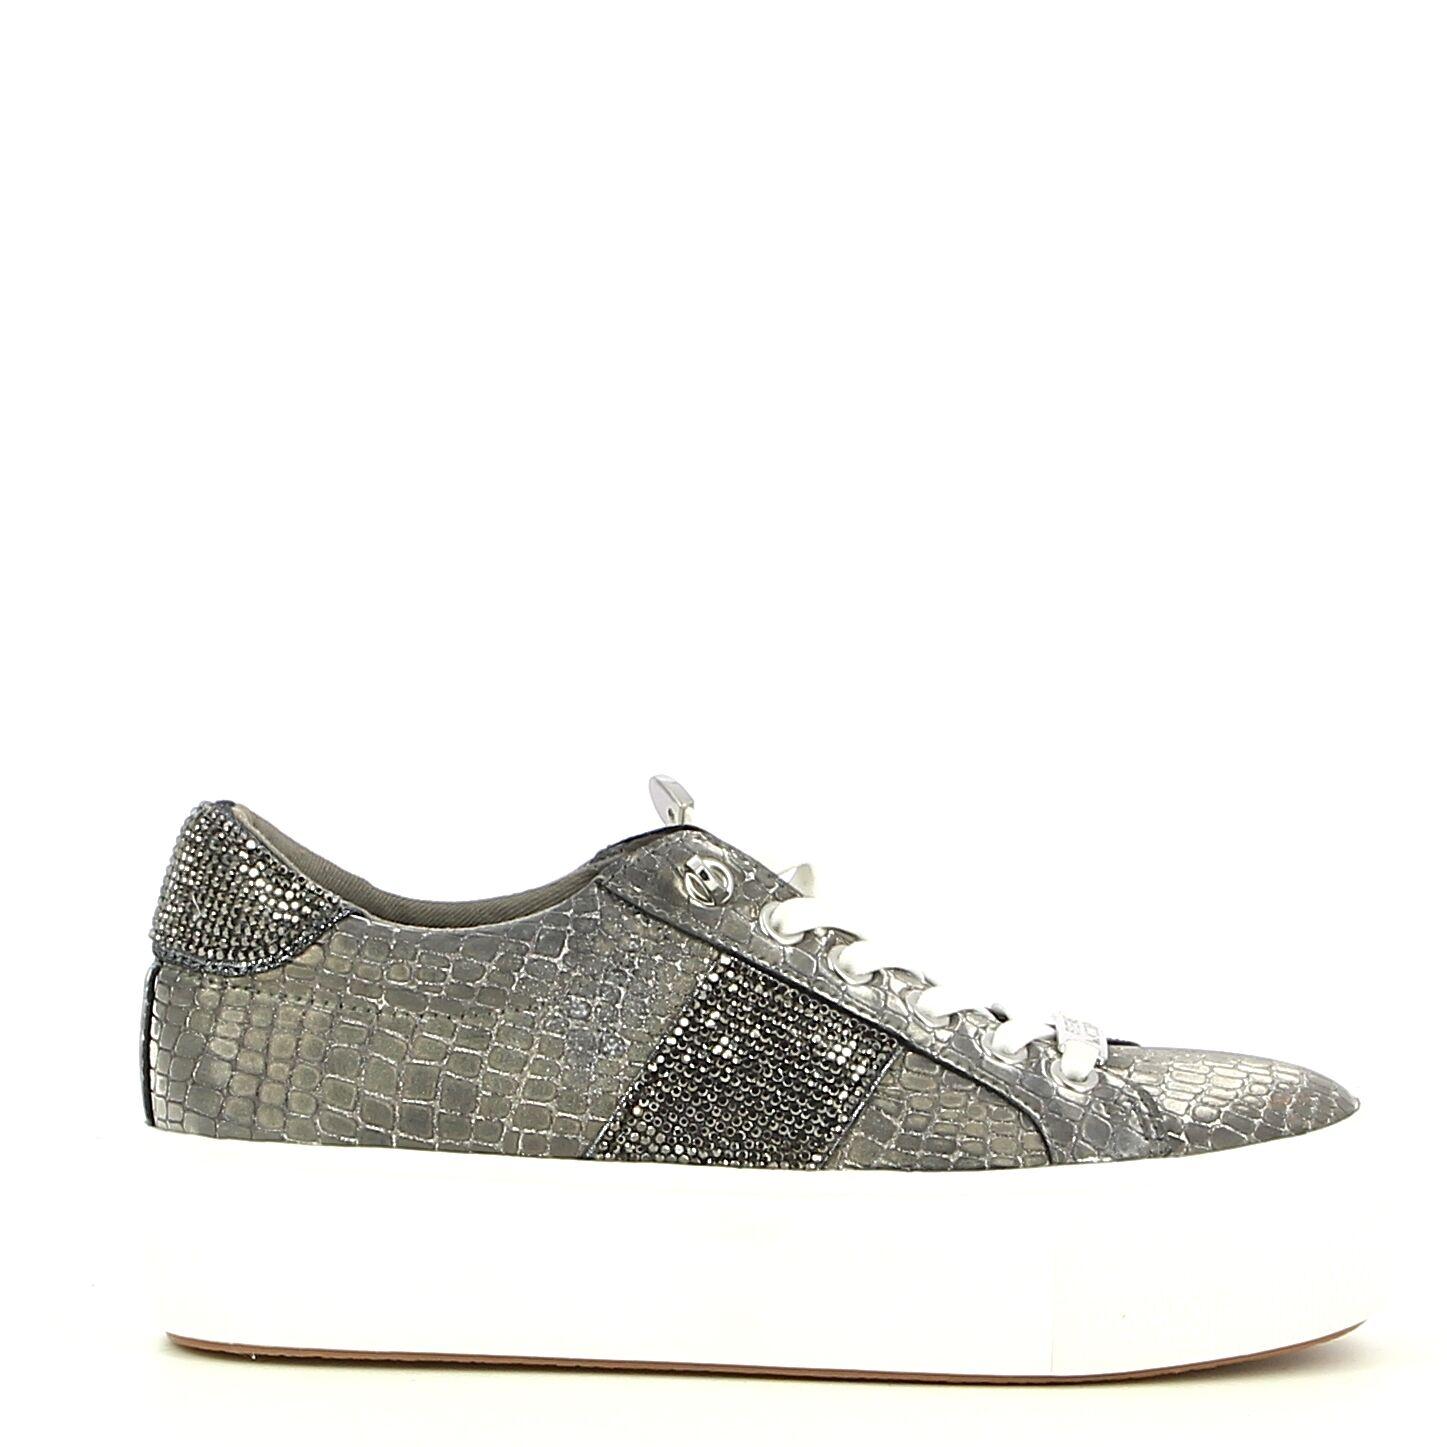 Steve Madden - Lood - Sneakers